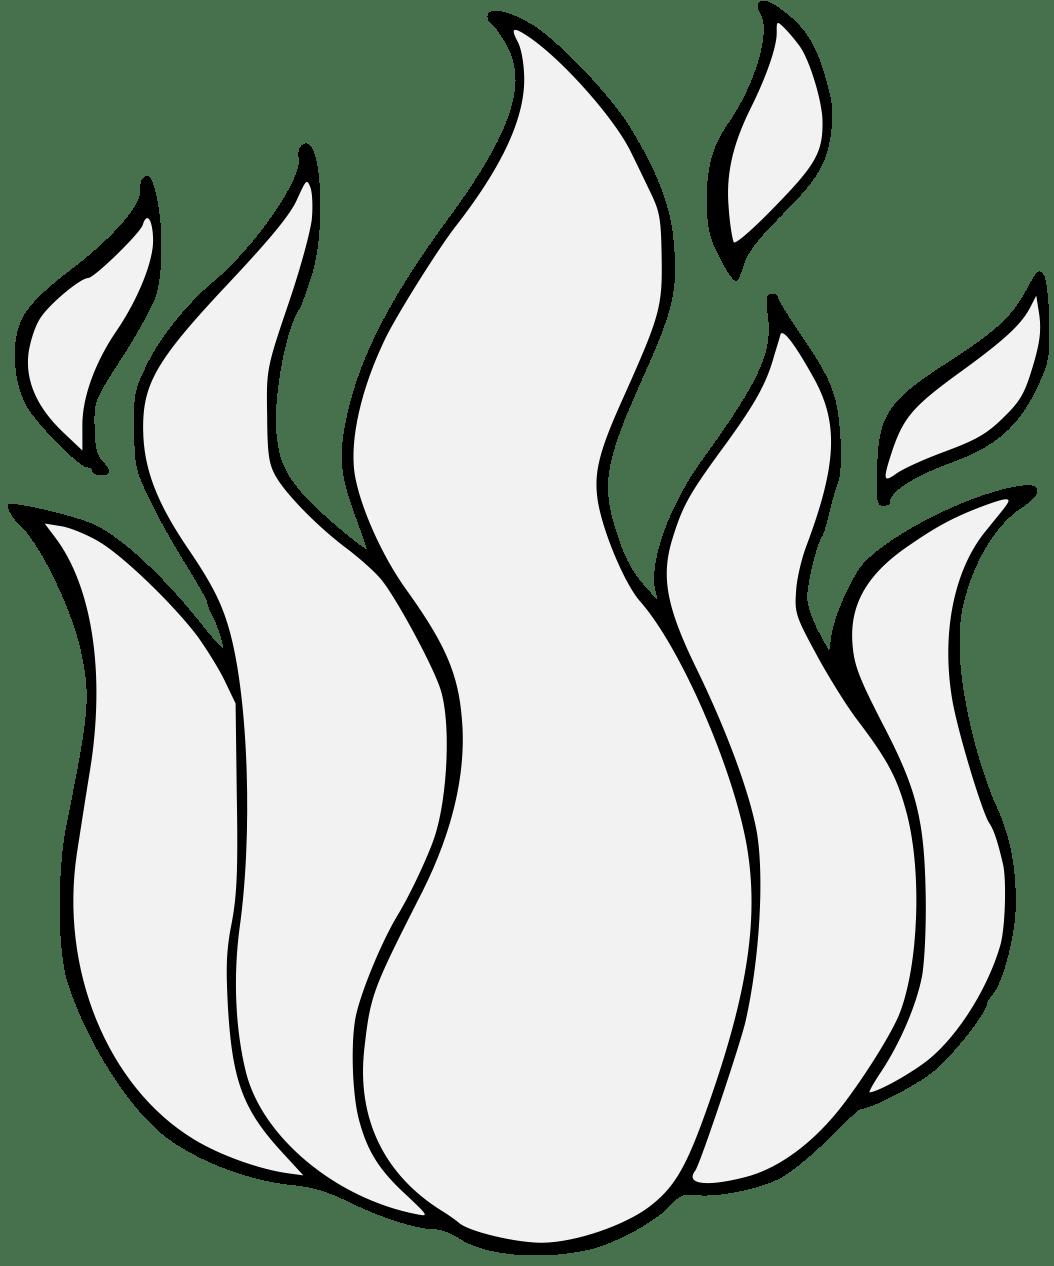 Clipart Flames Traceable Clipart Flames Traceable